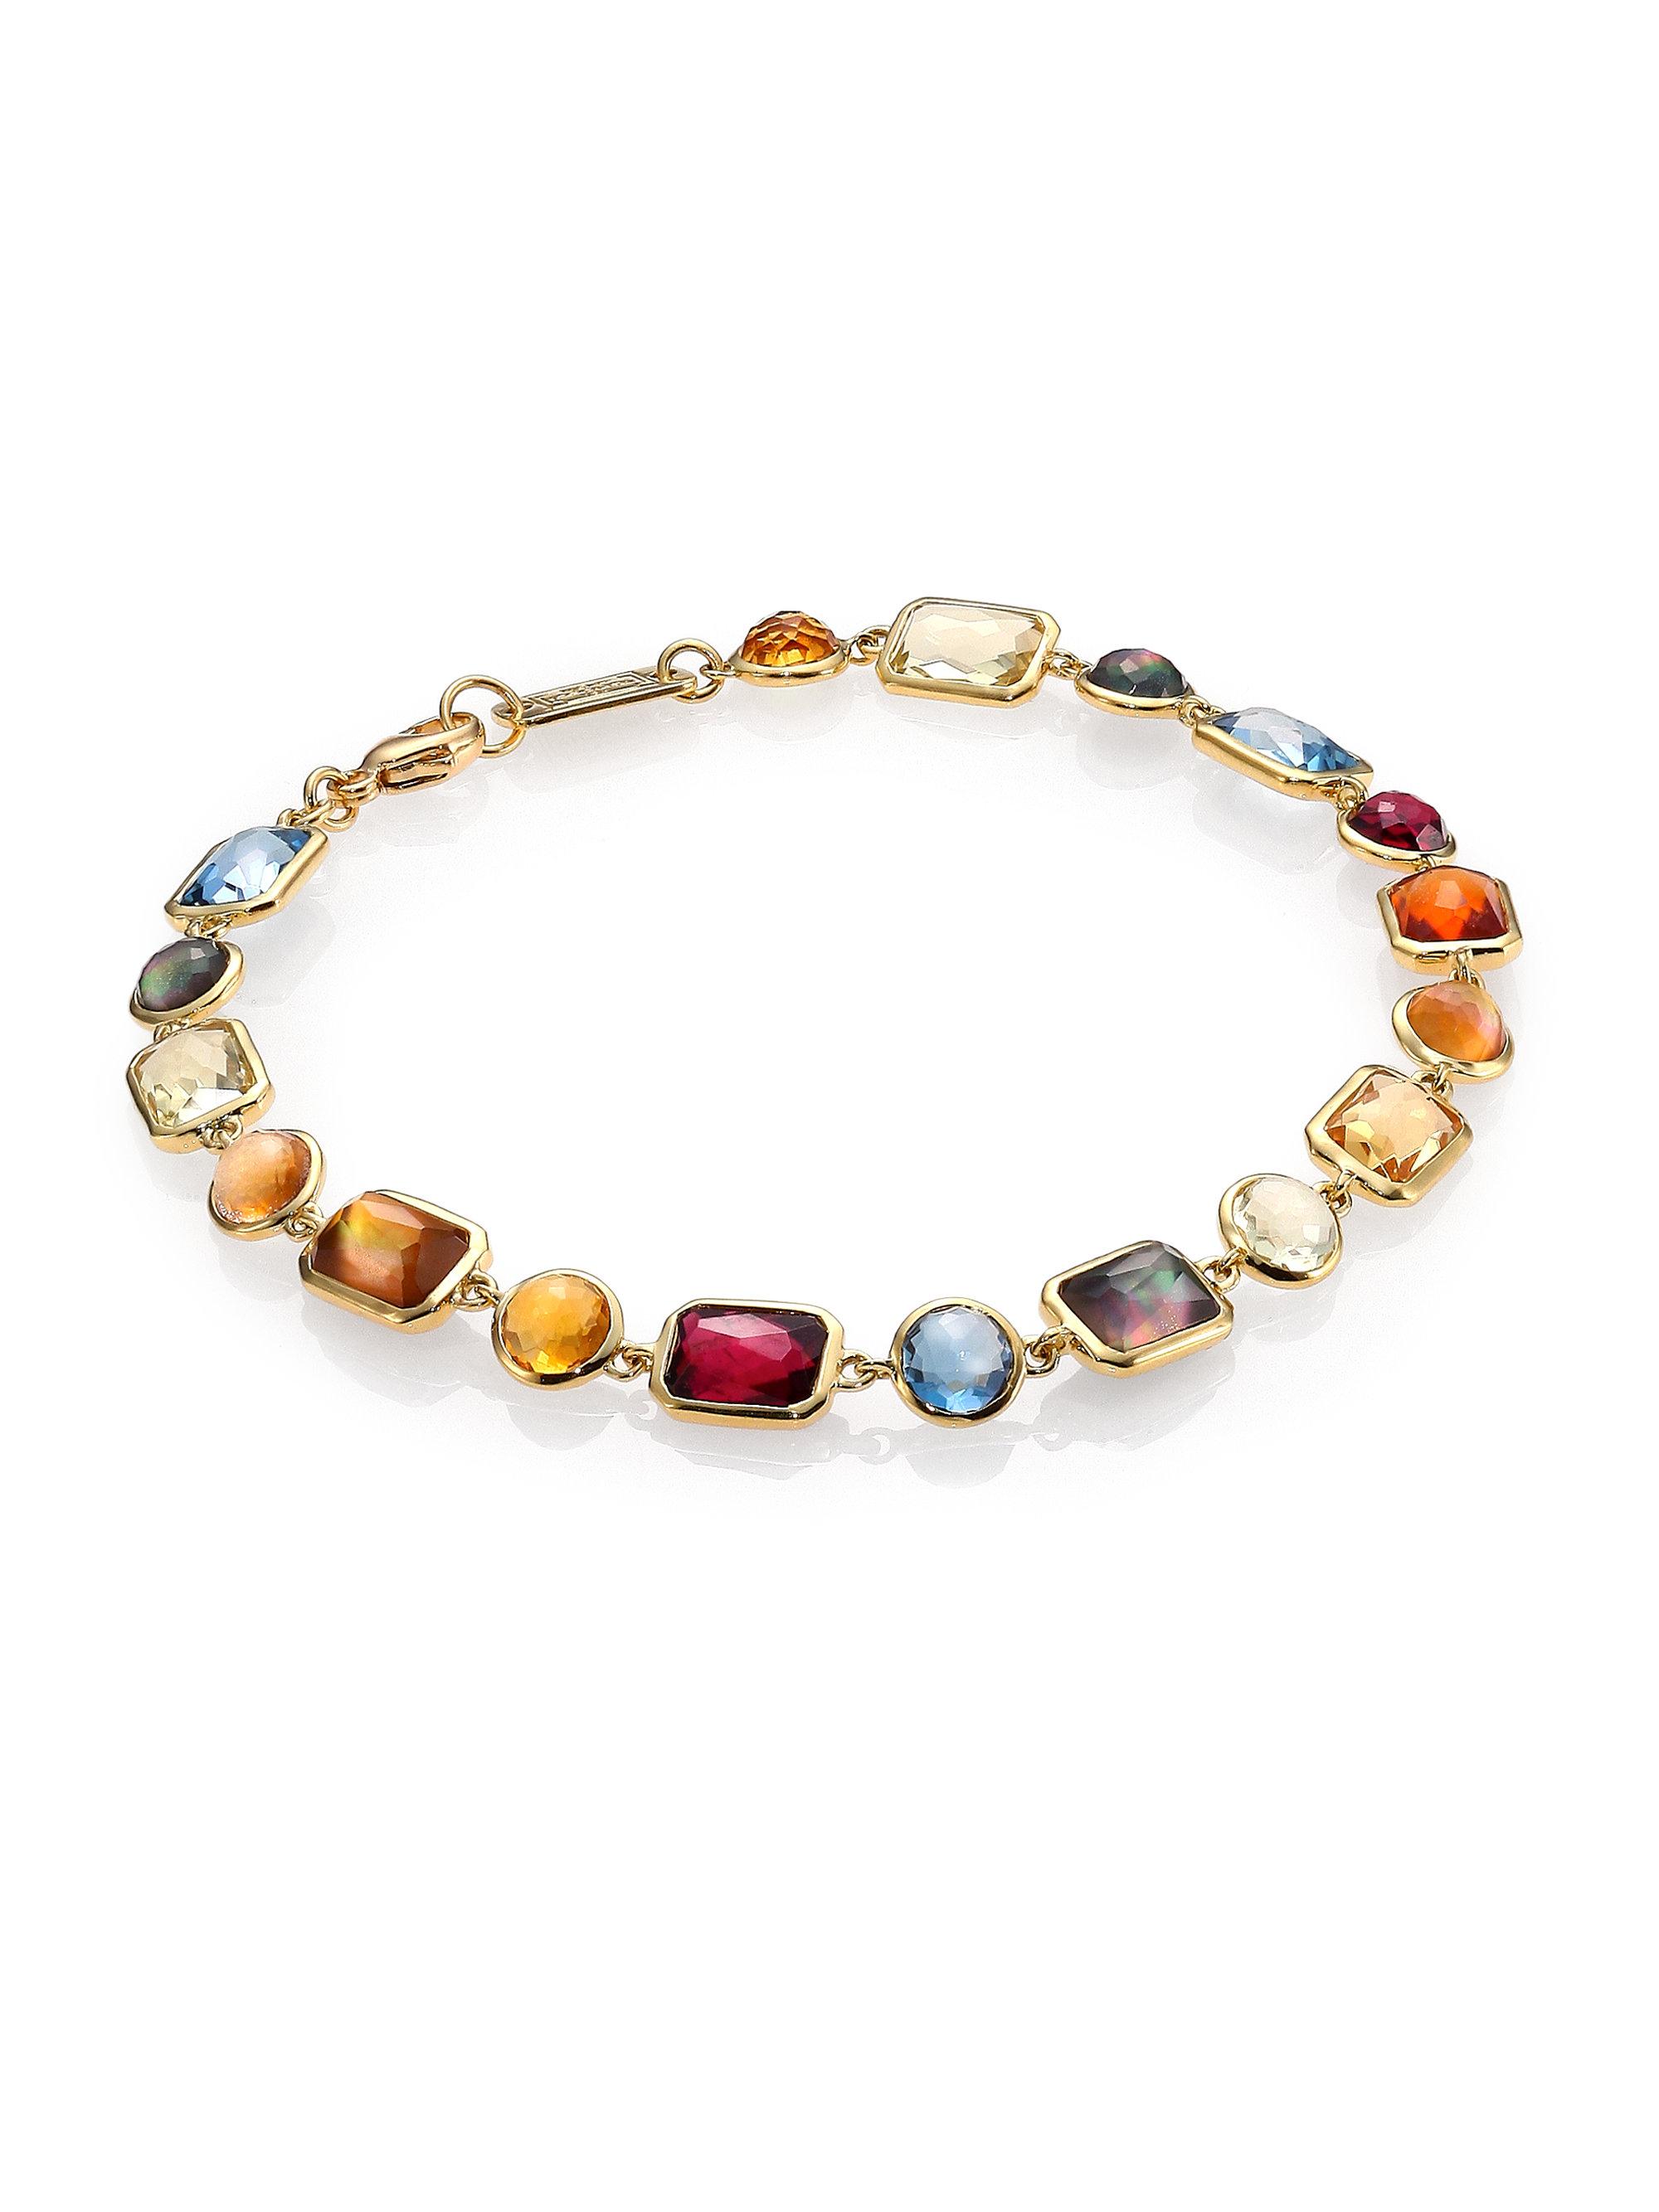 Image source: https://cdnd.lystit.com/photos/f58f-2014/08/08/ippolita-gold-rock-candy-marrakesh-semi-precious-multi-stone-18k-yellow-gold-gelato-link-bracelet-product-1-22321988-1-652632265-normal.jpeg last access 1st September 2016